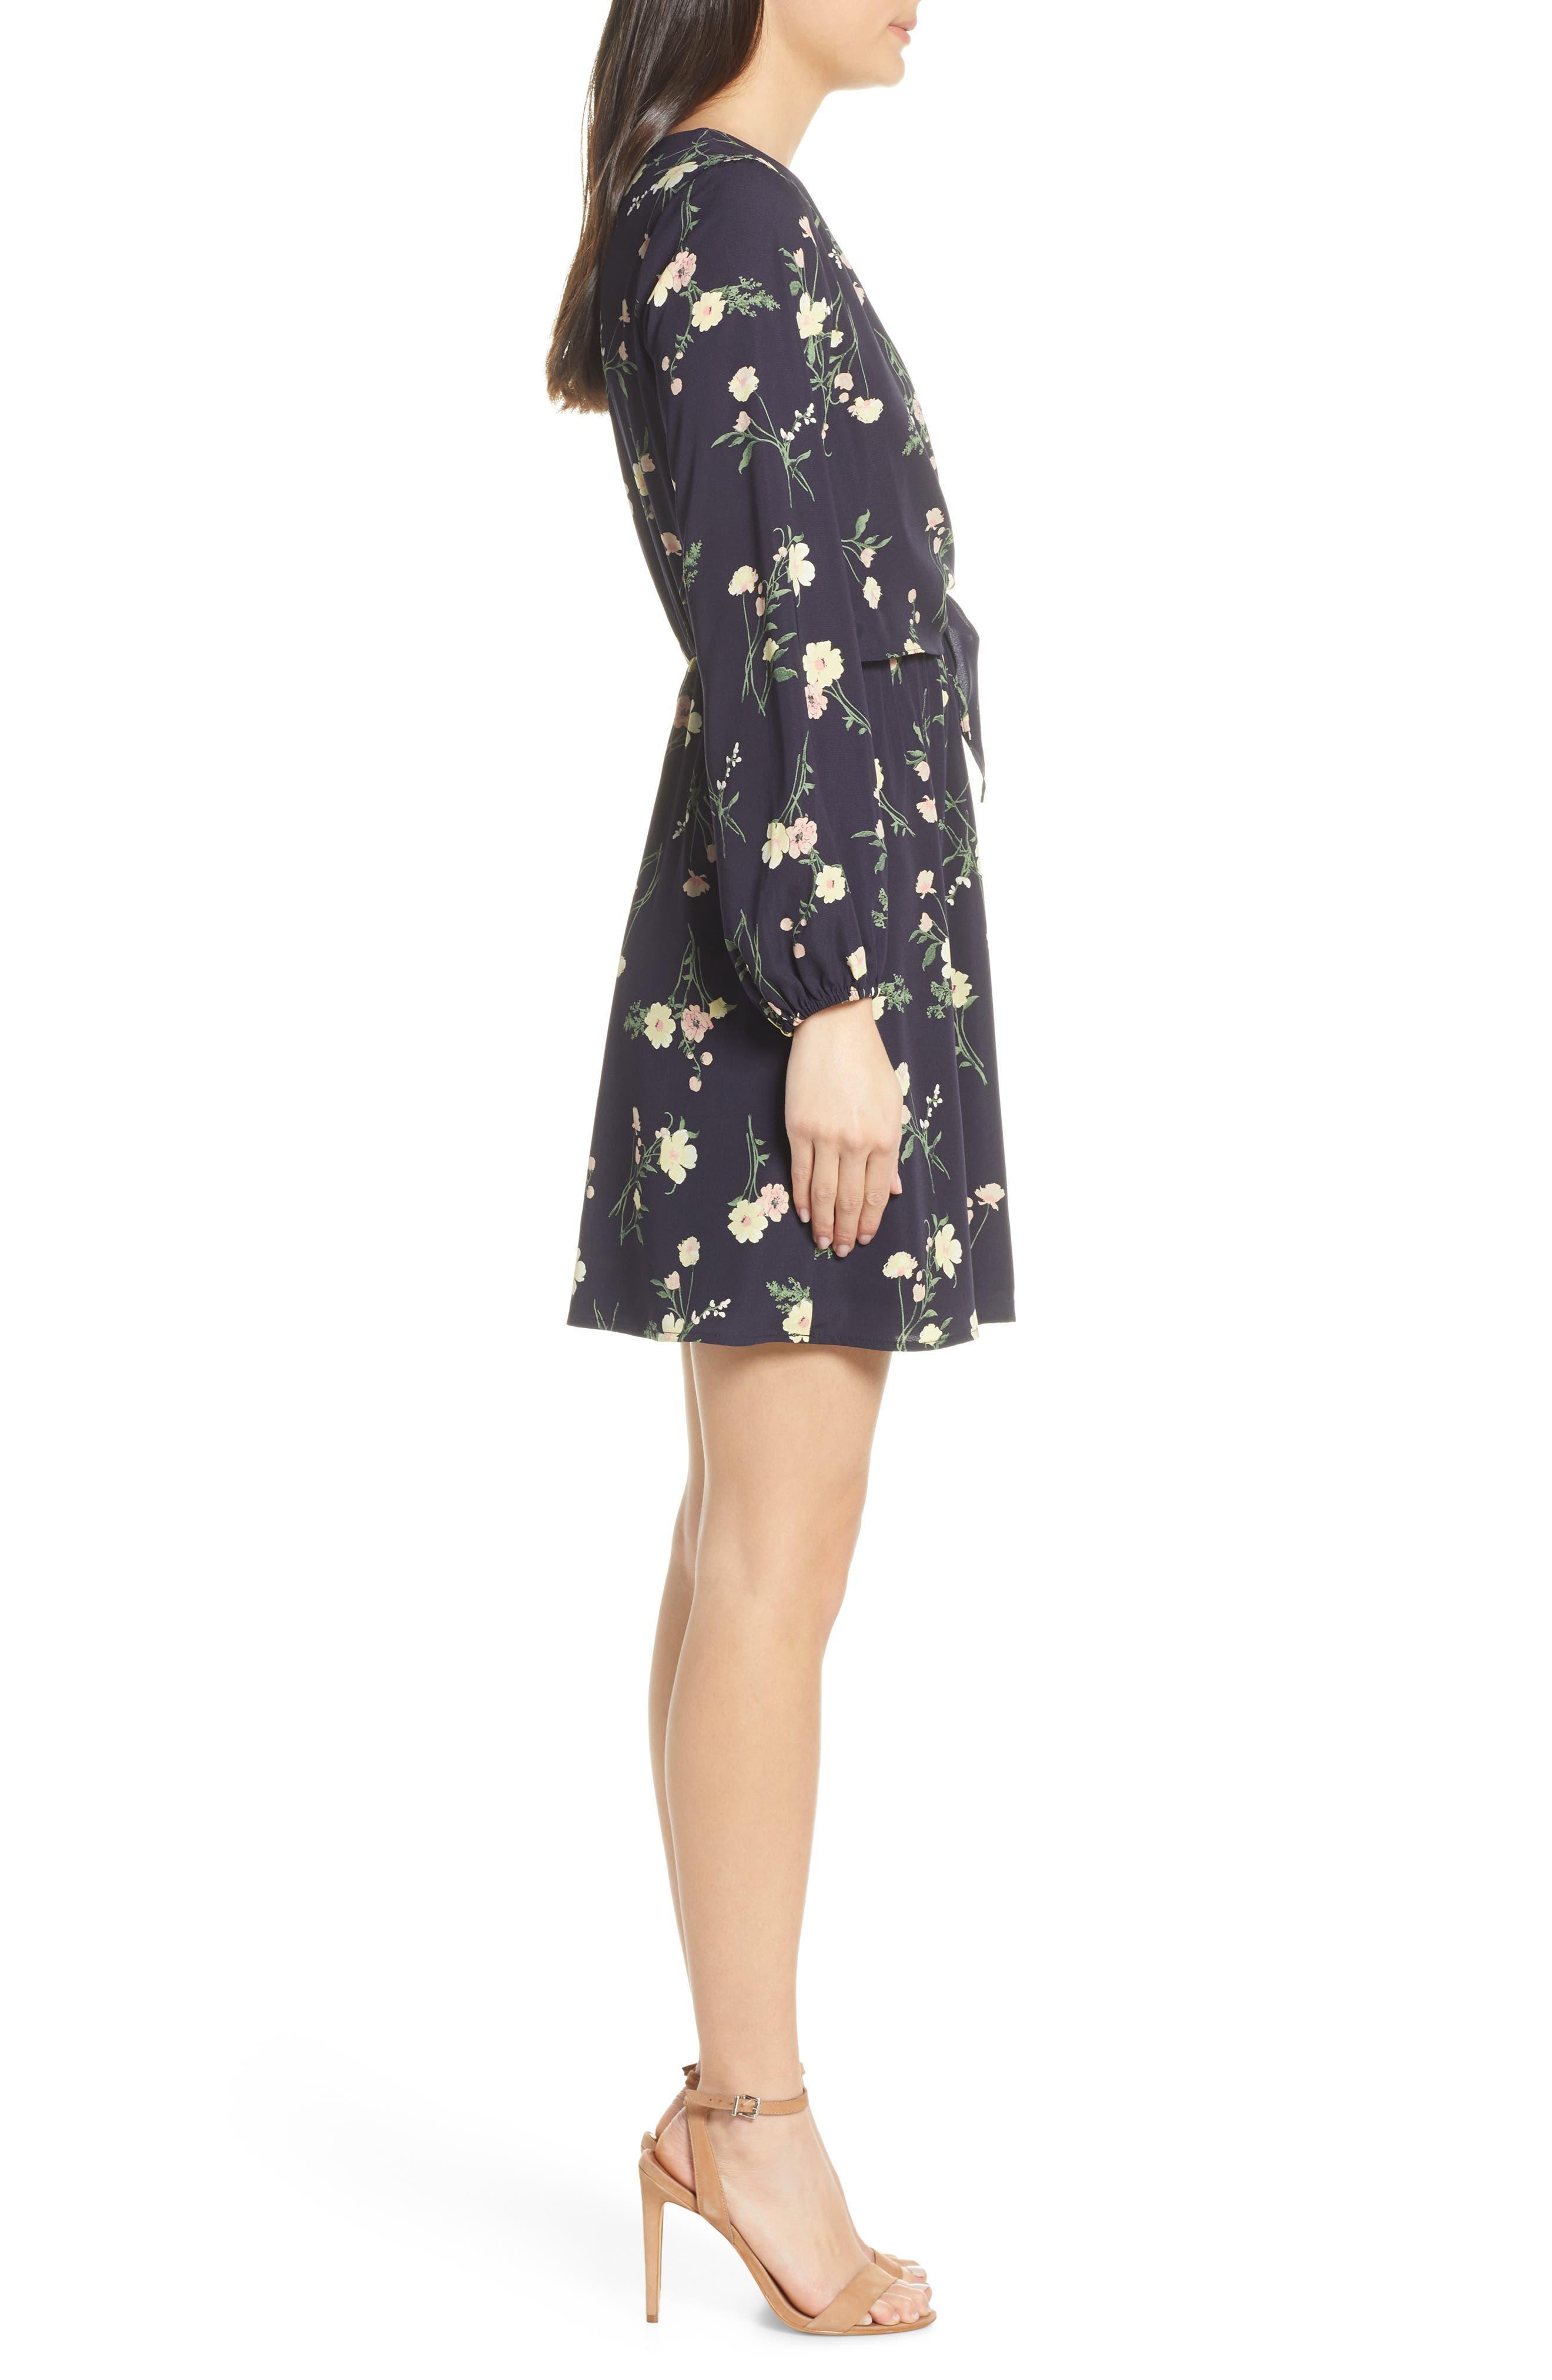 19 COOPER, Long Sleeve Floral Dress, Alternate thumbnail 4, color, NAVY FLORAL